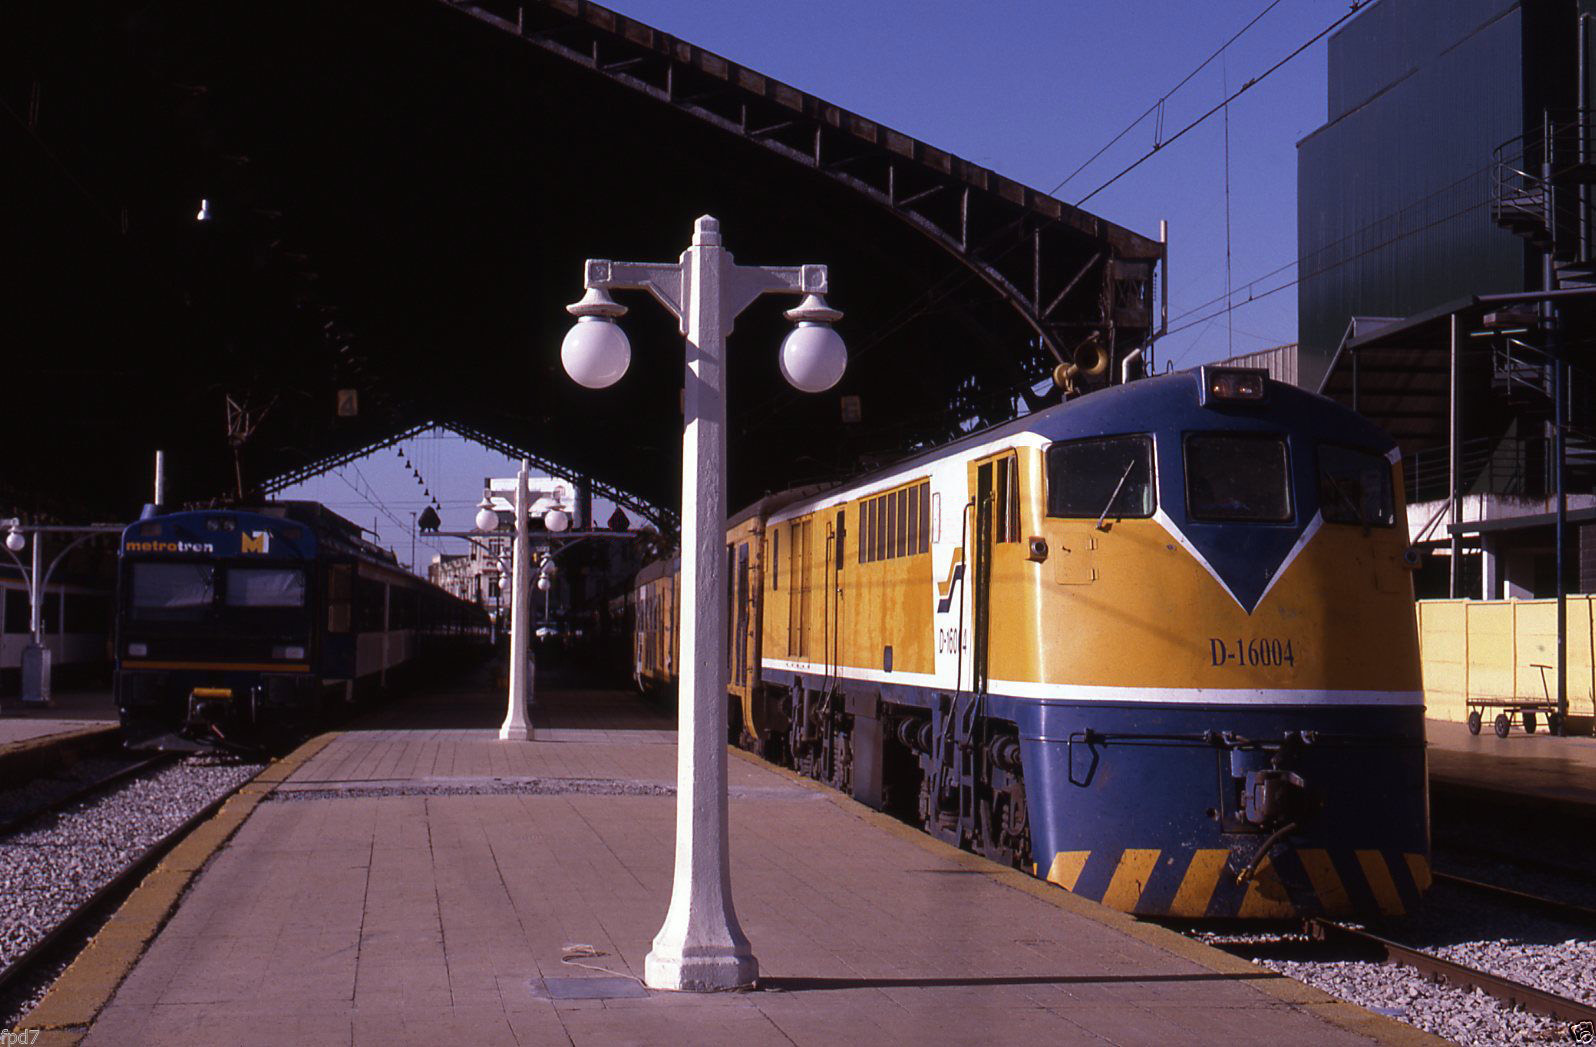 Enterreno - Fotos históricas de chile - fotos antiguas de Chile - Estación Central de Santiago, 1995